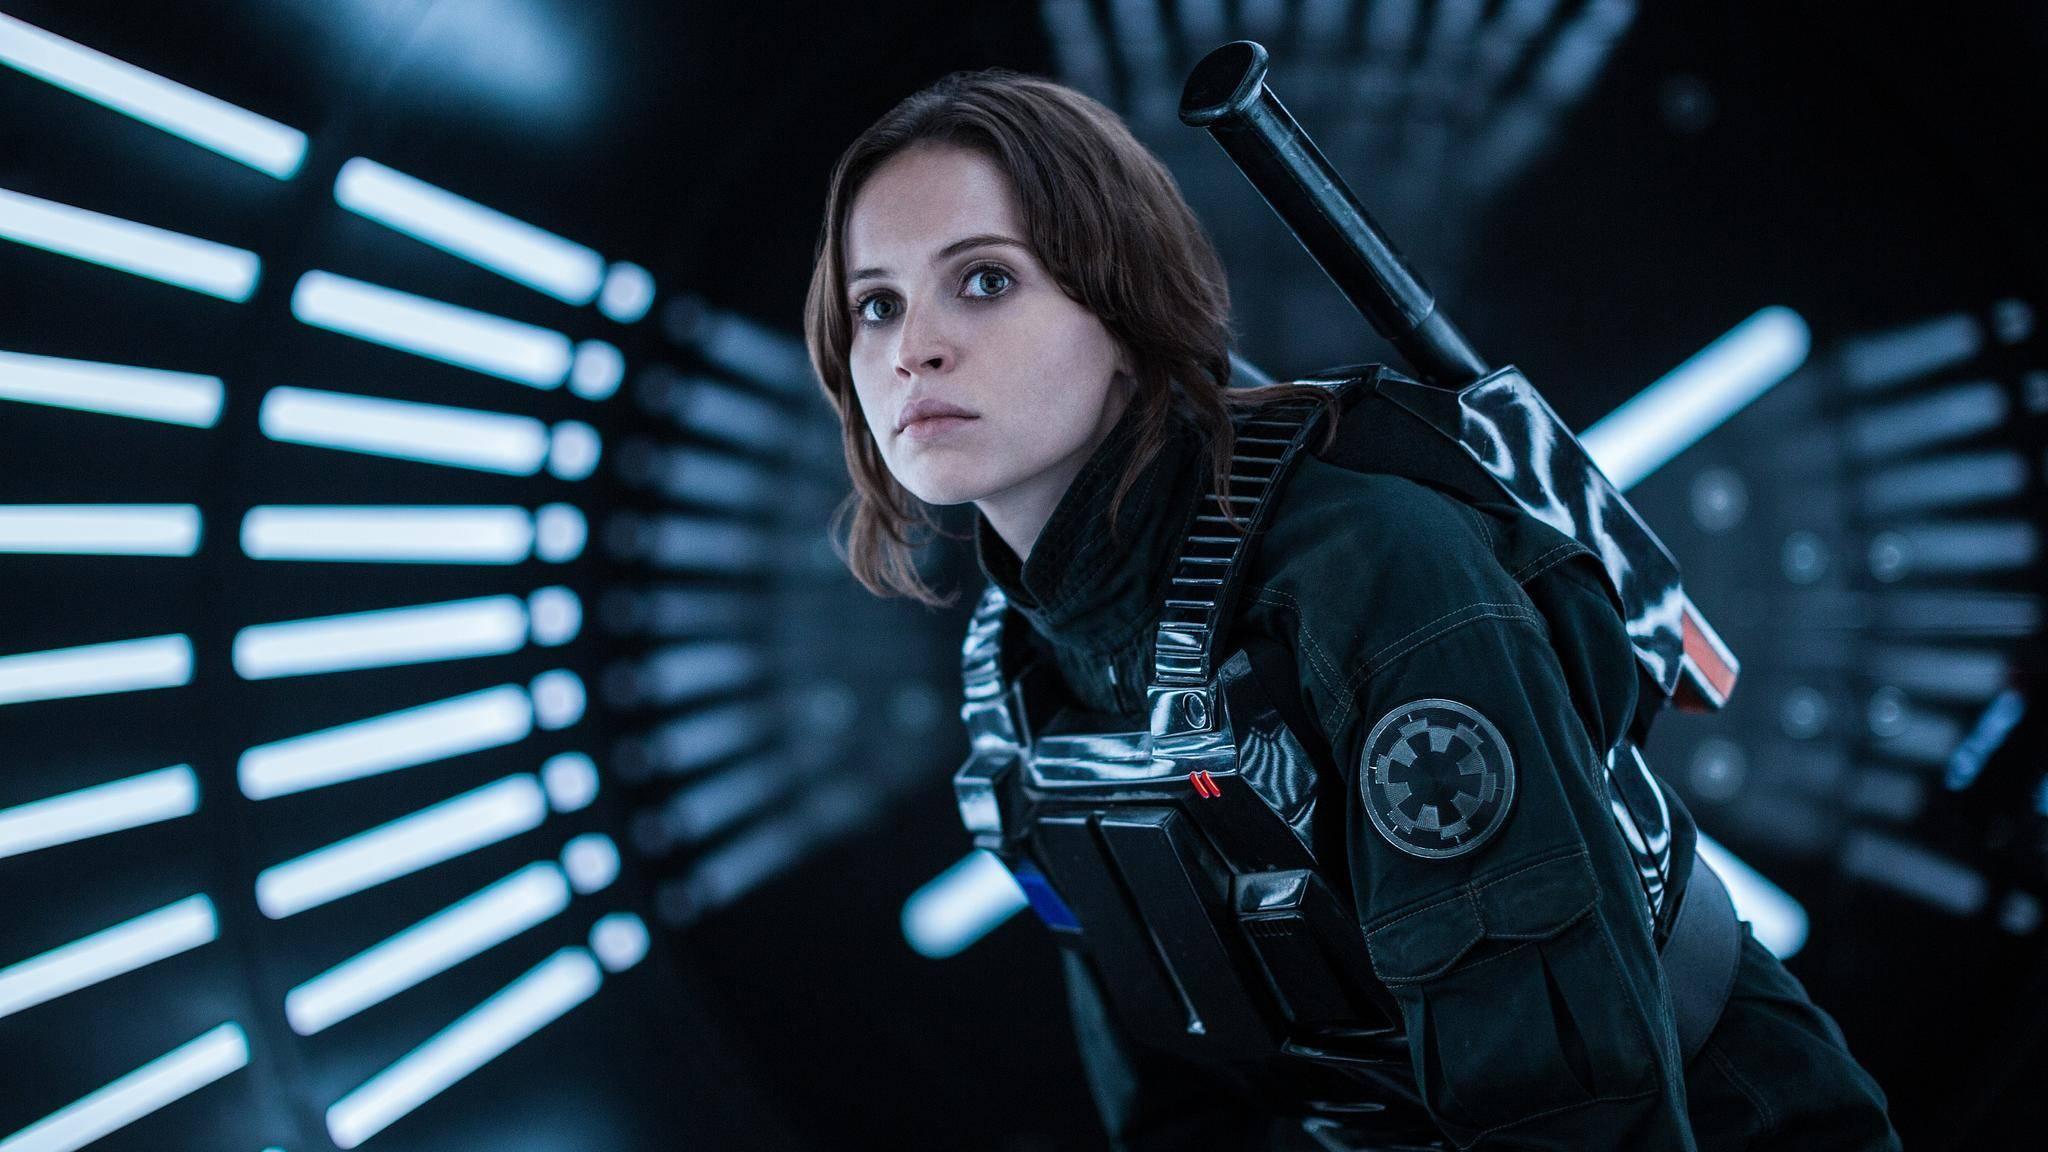 Rogue One: A Star Wars Story _ Jyn Erso (Felicity Jones)